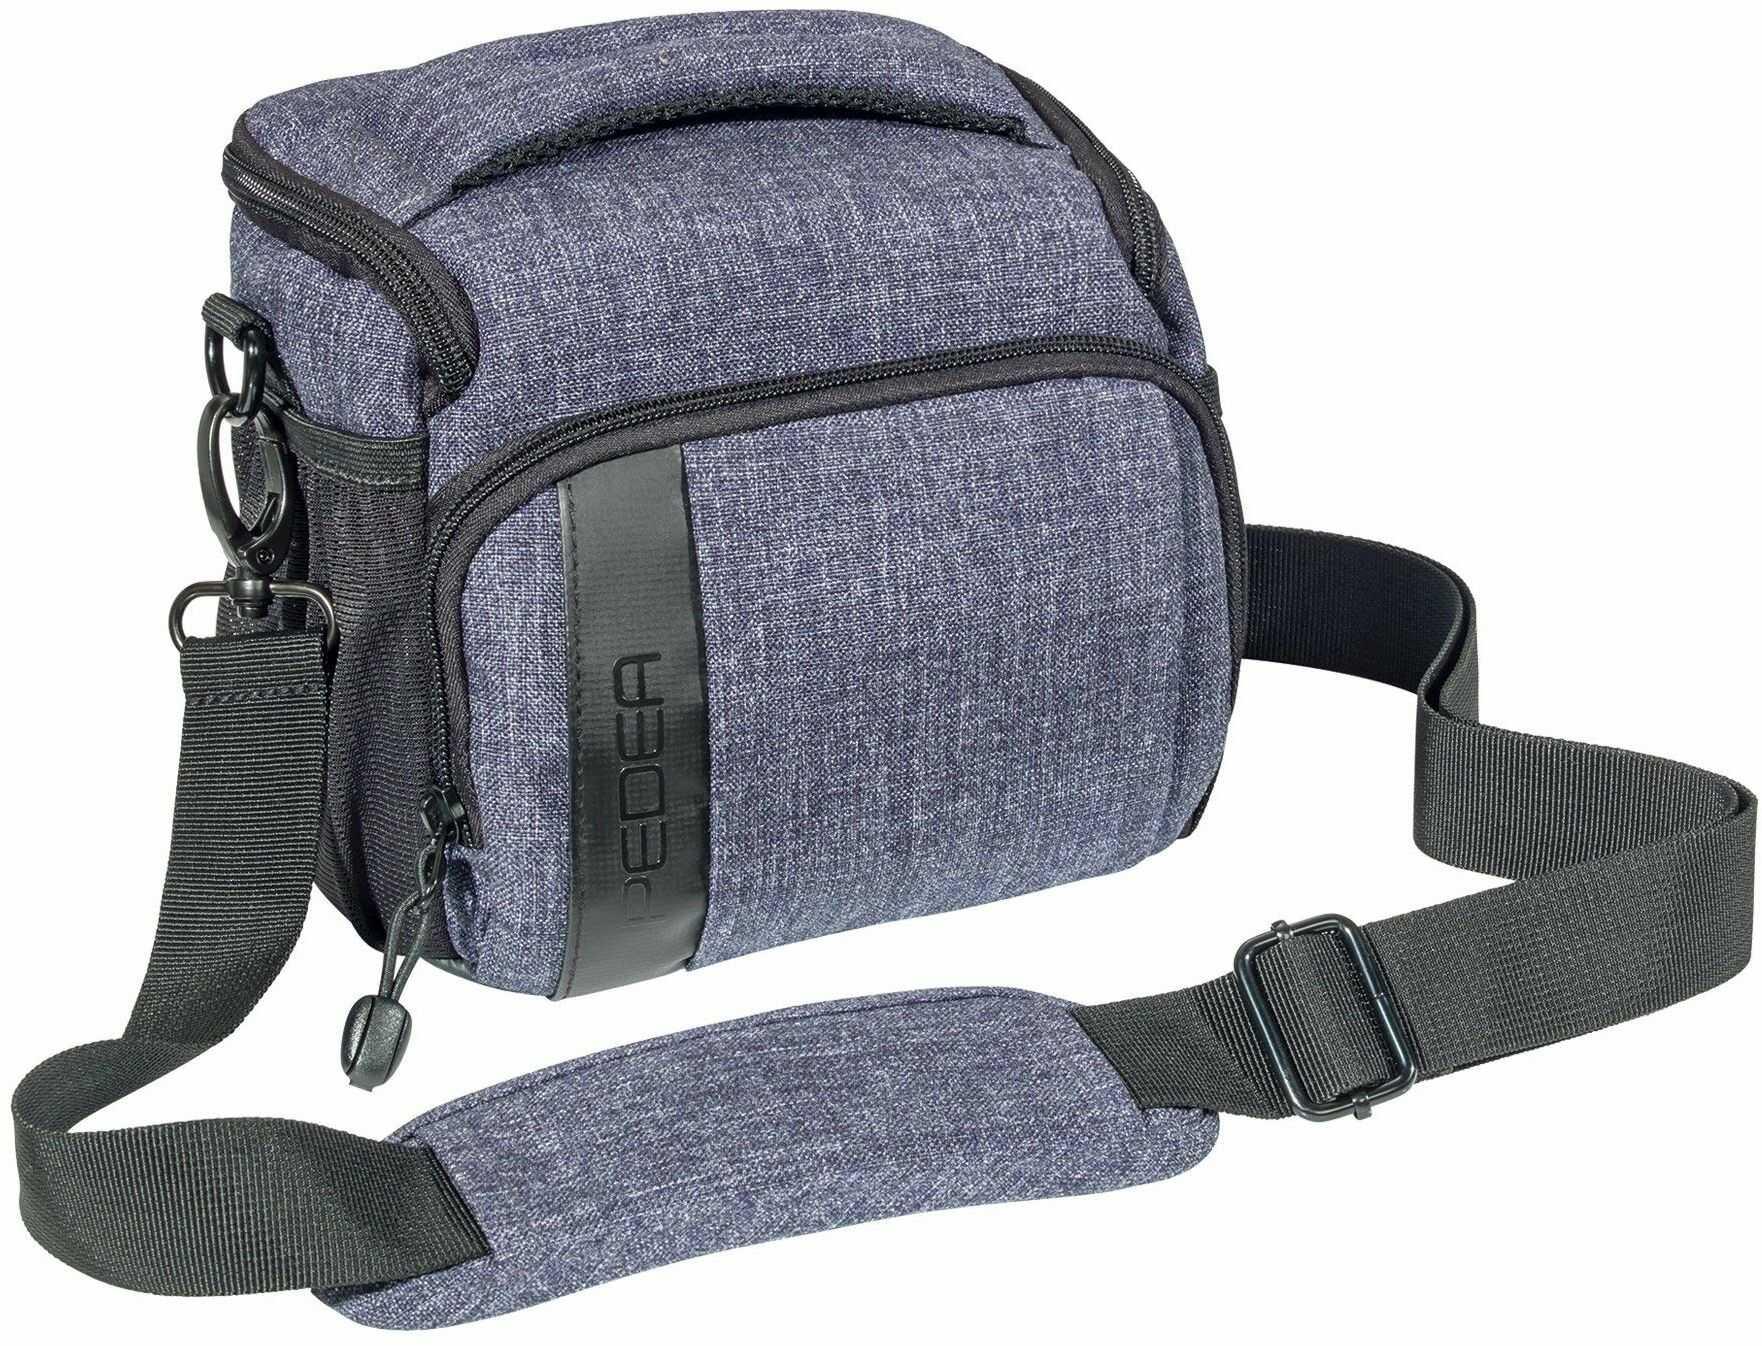 "Torba na aparat""Fashion"", Panasonic Lumix DMC G70, G81, GM5, GX80, GH4, GX8 / Sony Alpha 6500 / Nikon D5600"